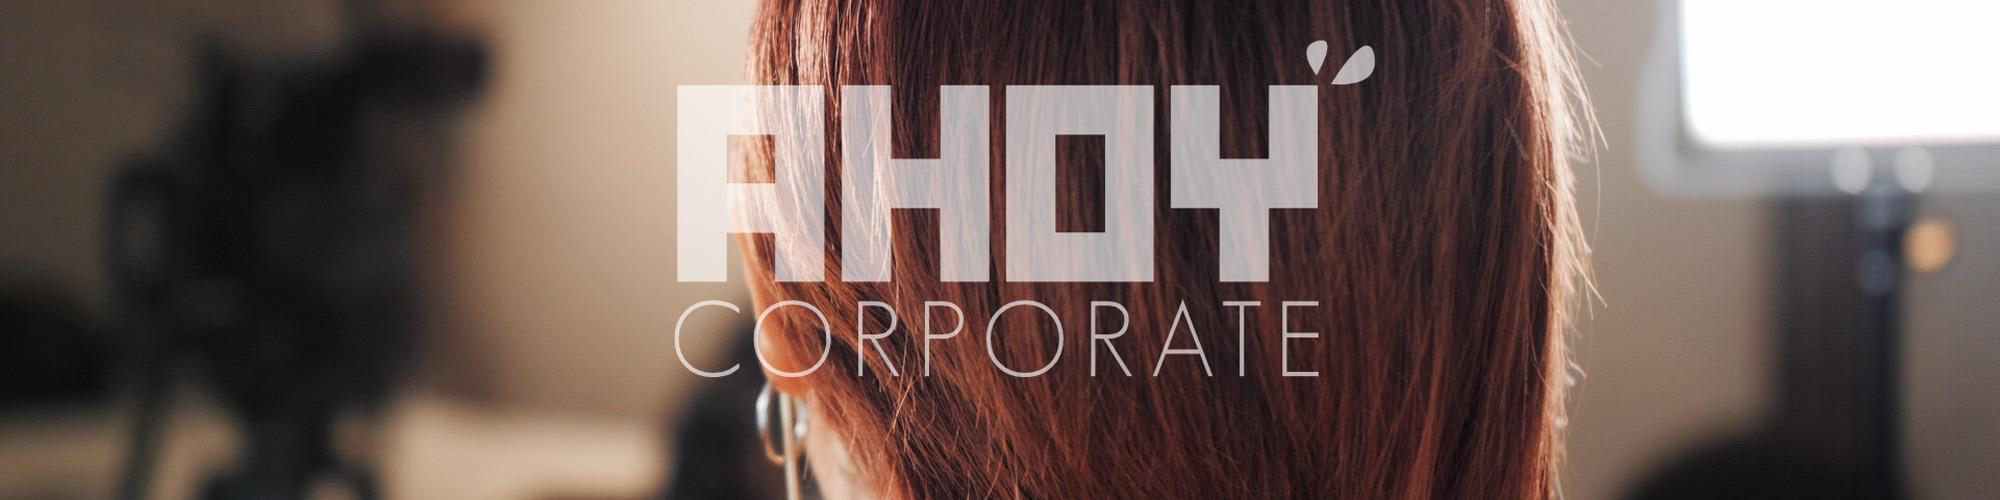 ahoy-corporate-header